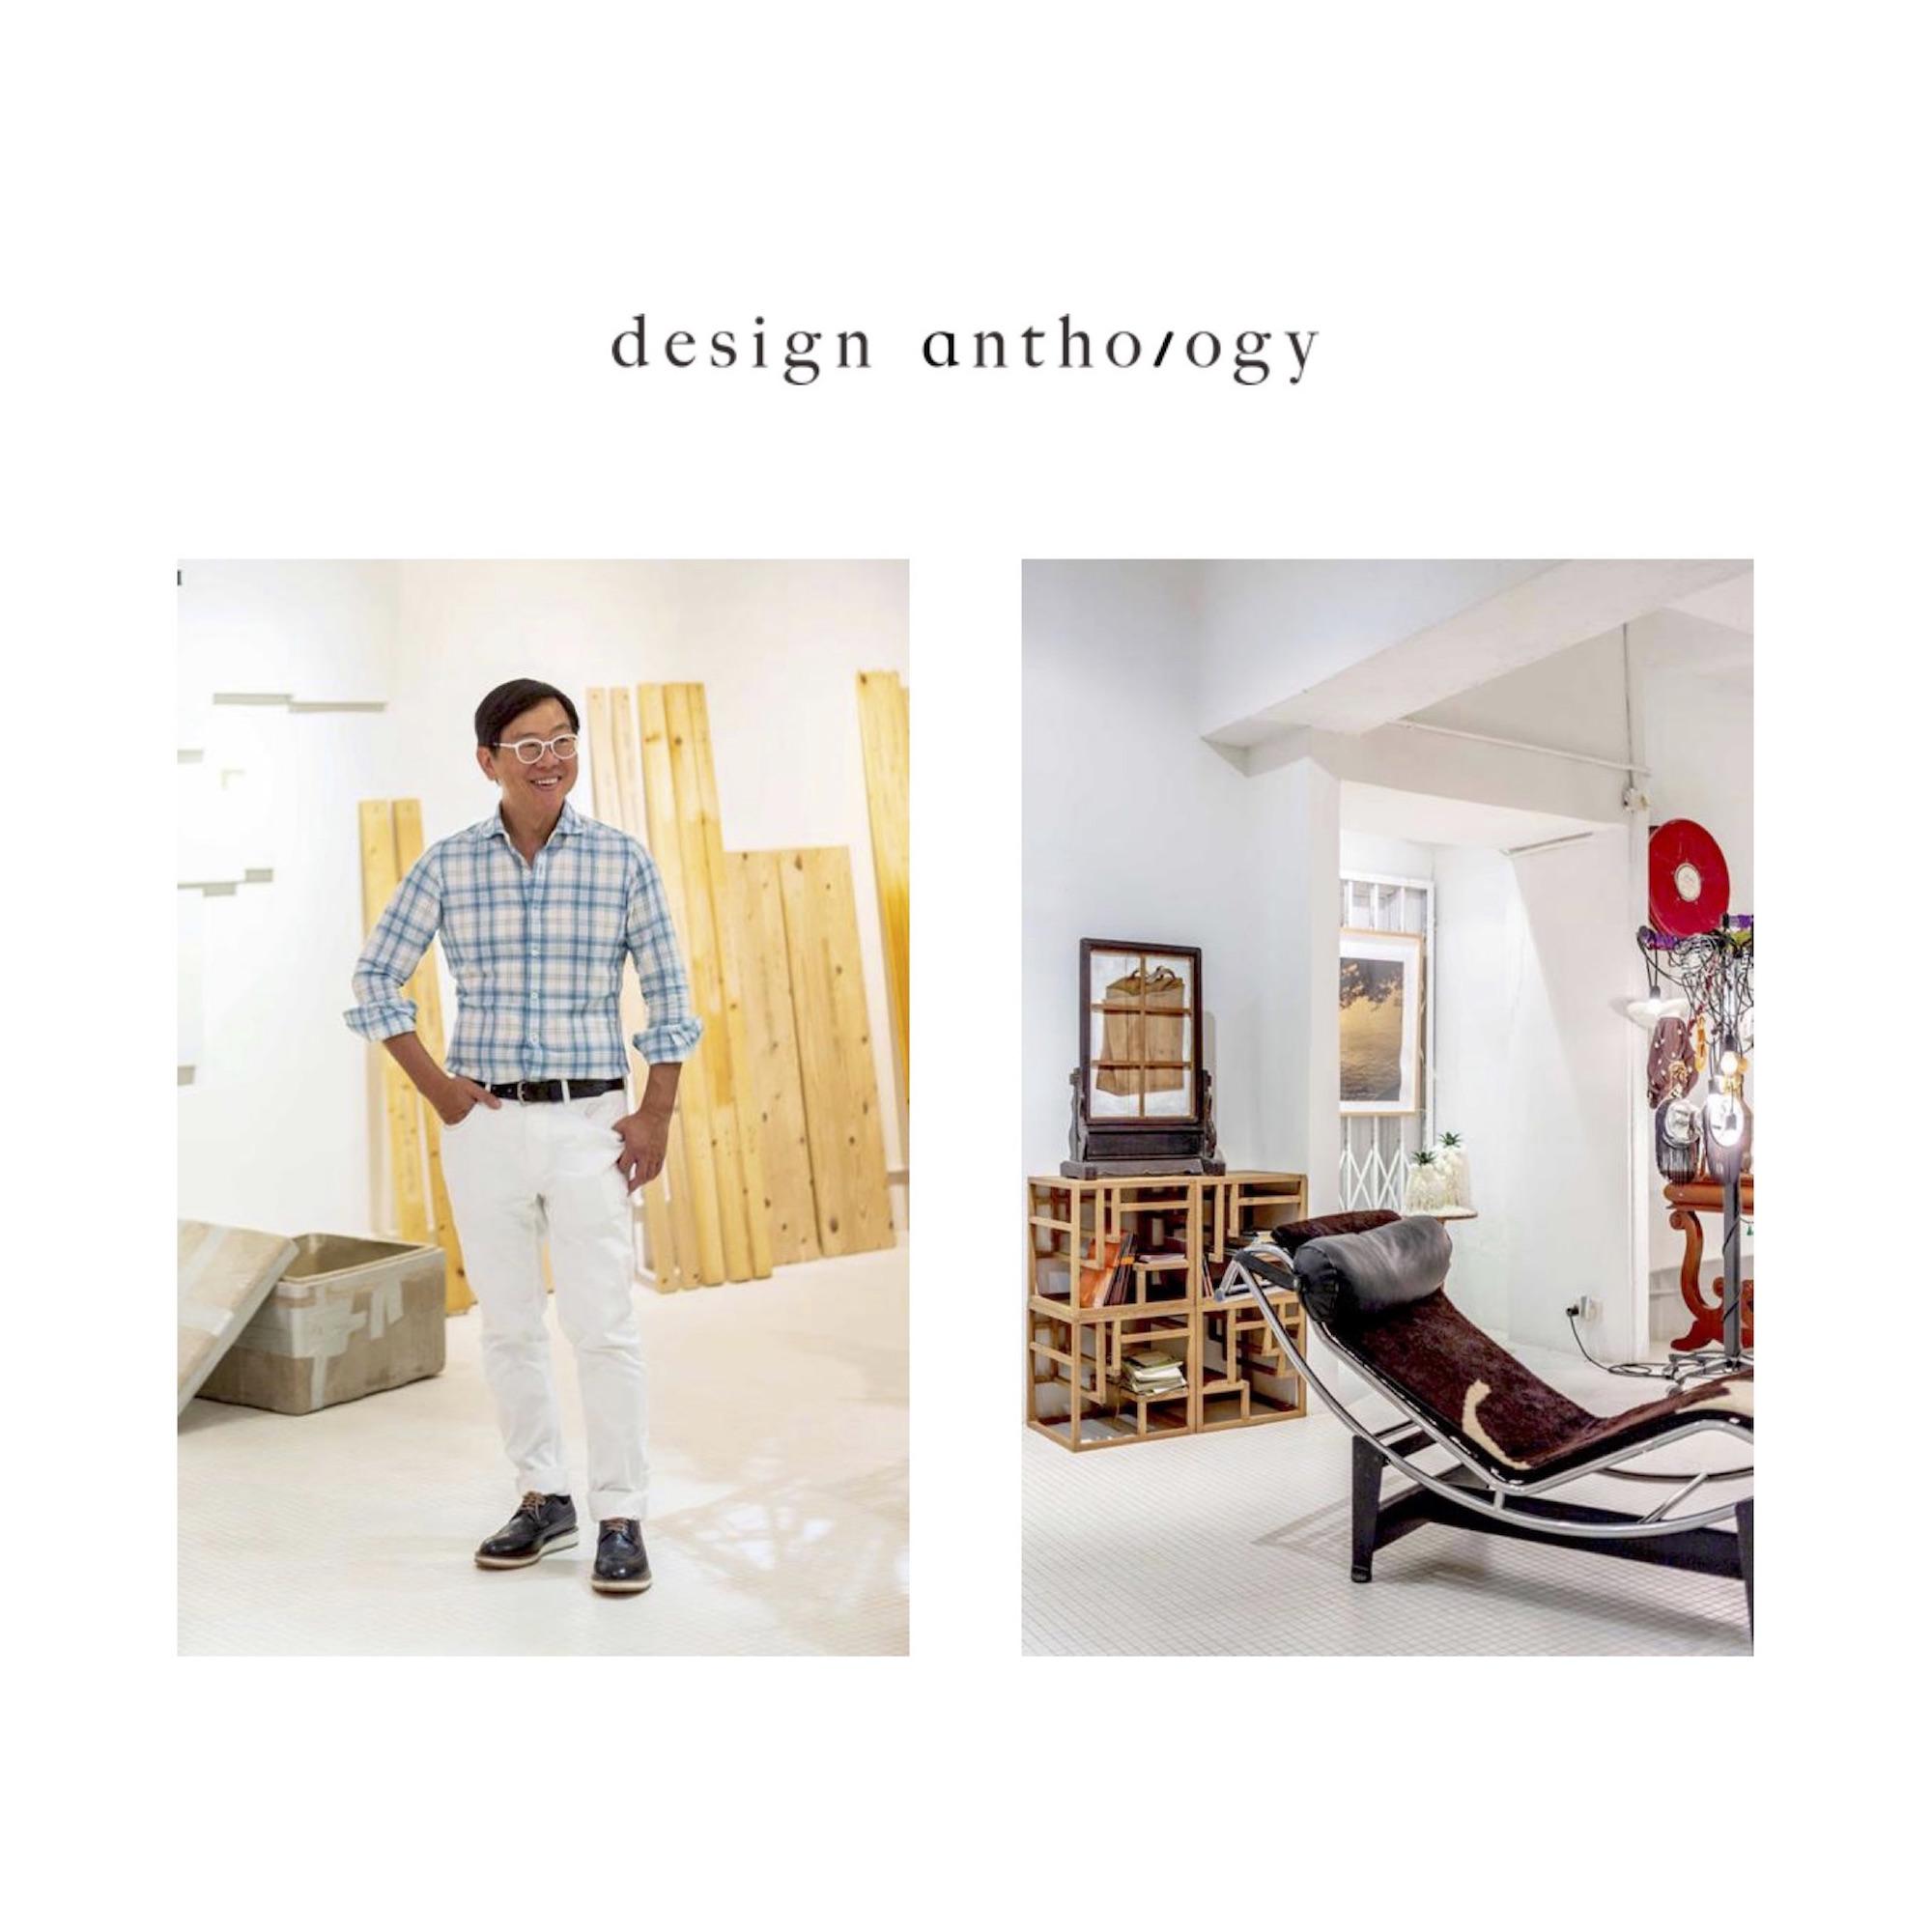 Design Anthology William Lim's private art space at Wong Chuk Hang